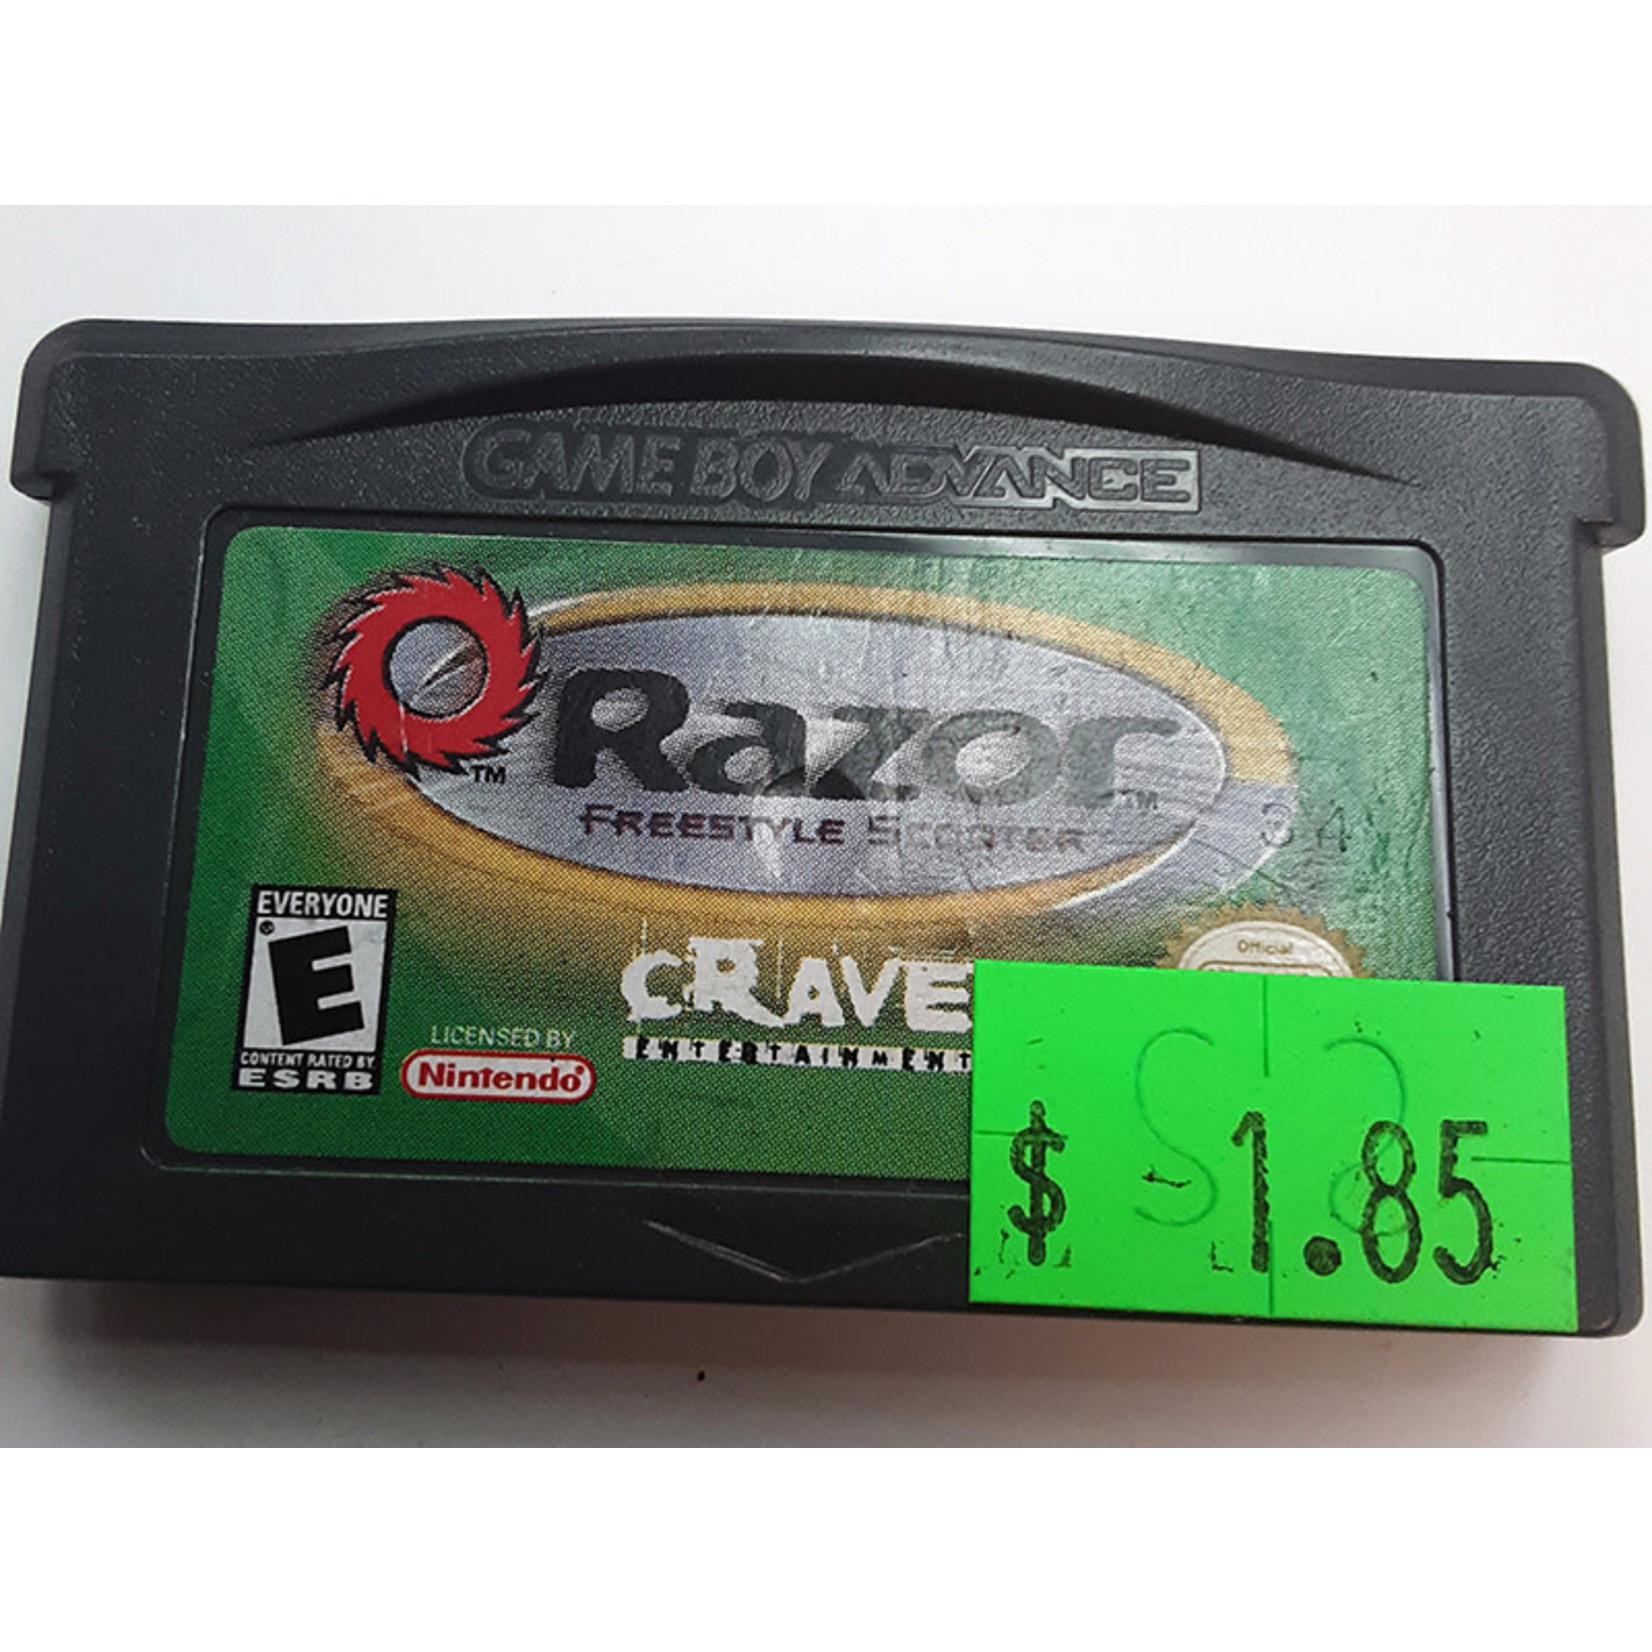 GBAu-Razor Freestyle Scooter (cartridge)